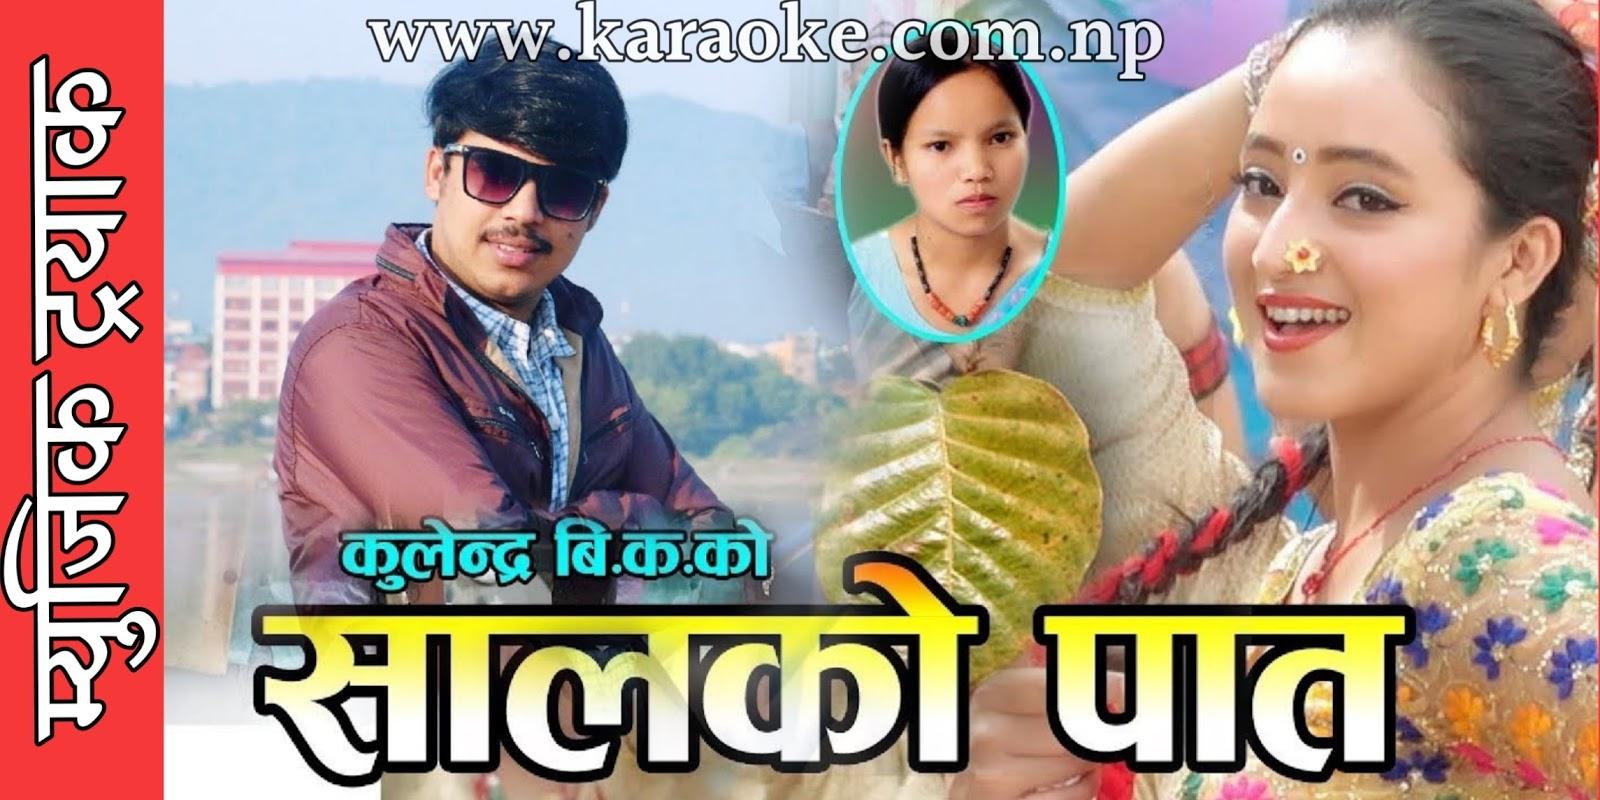 Karaoke of Salko Pata Tapari Huni by Kulendra BK and Bishnu Majhi